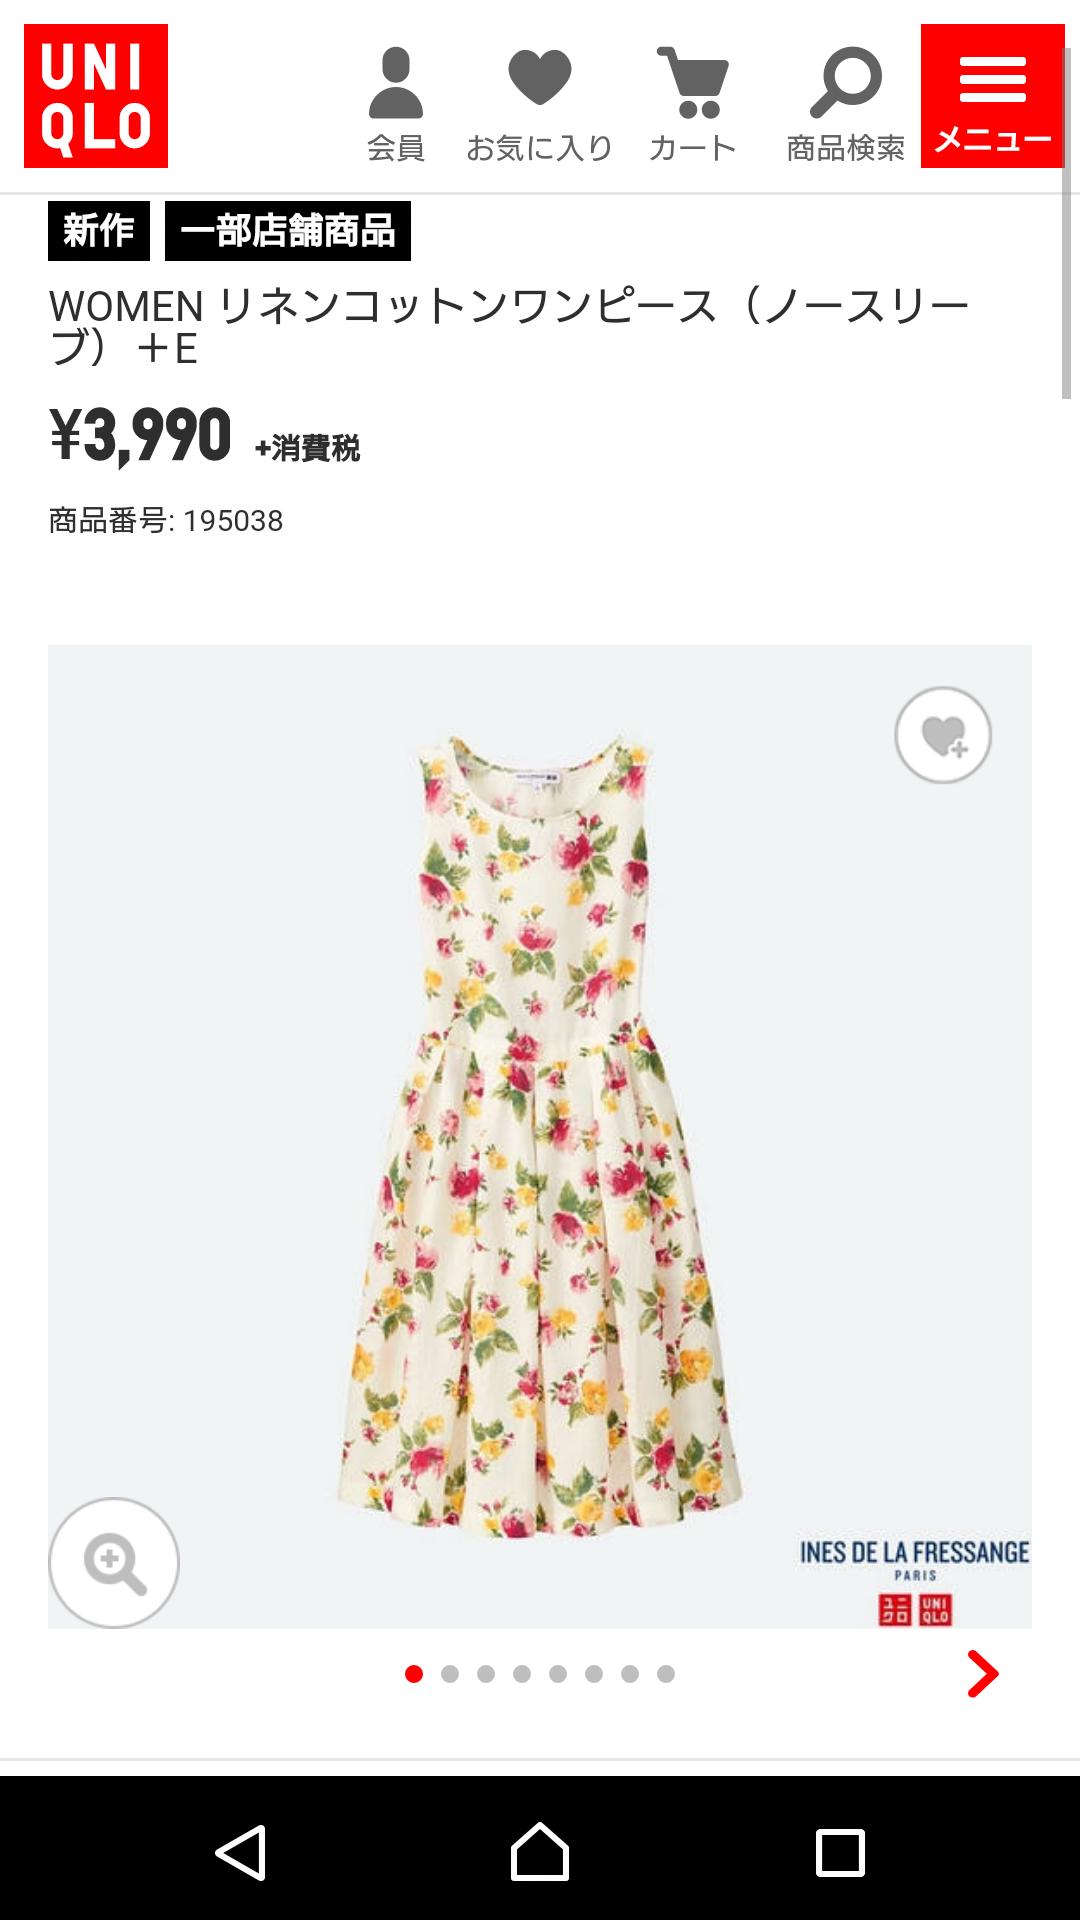 GU、ユニクロで春服を購入された方!